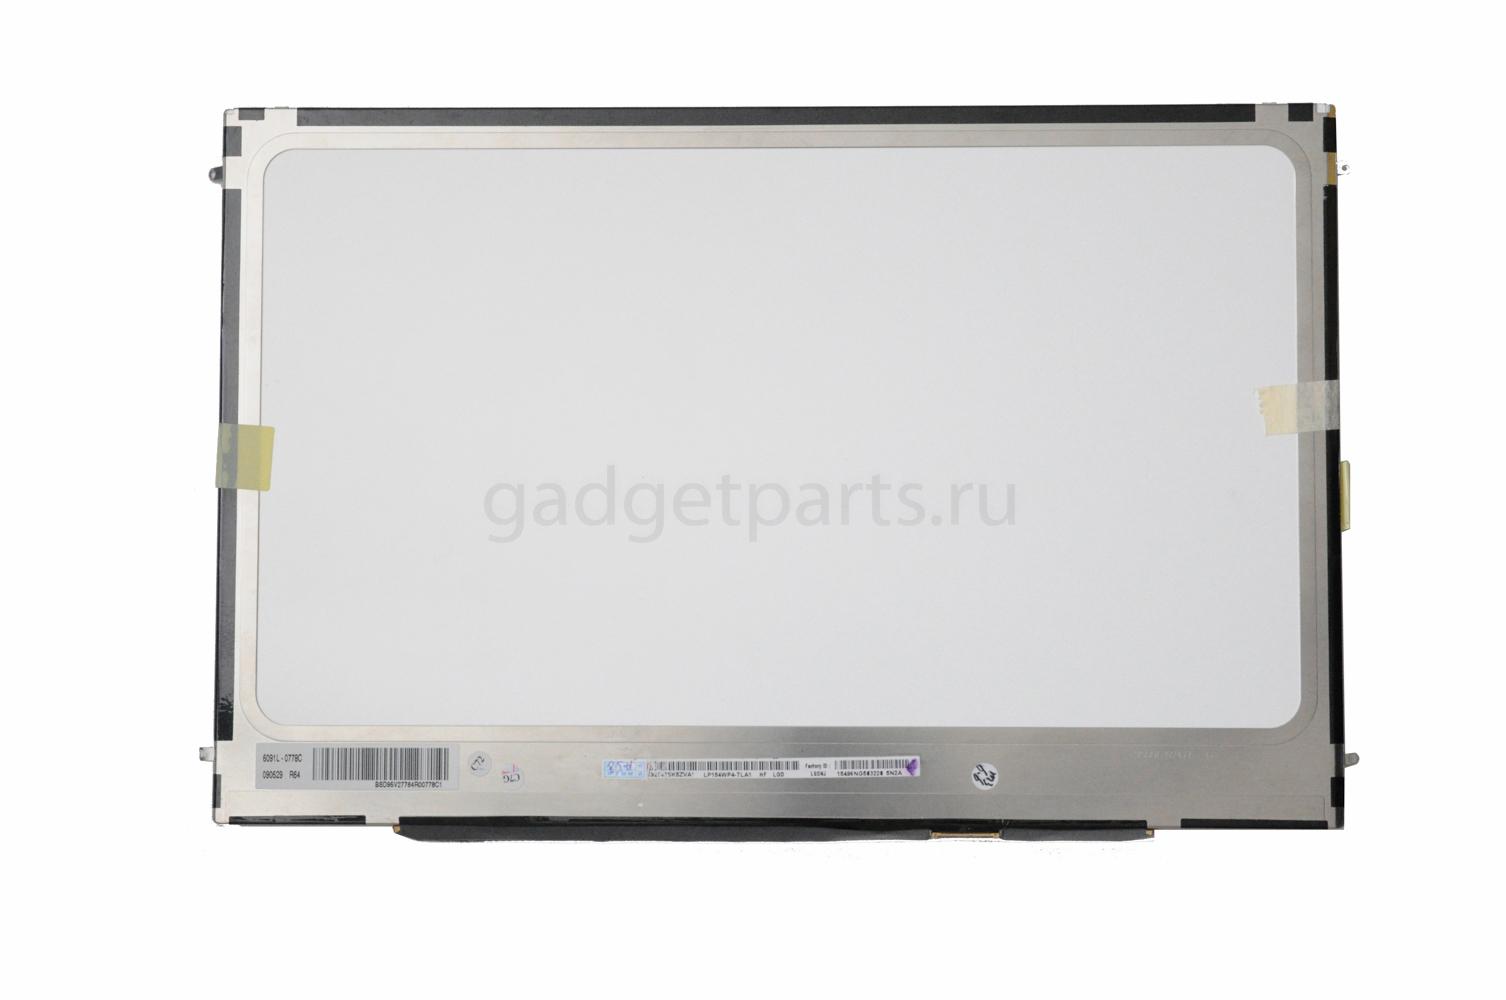 Дисплей MacBook Pro 15 A1286 2009-2013 года